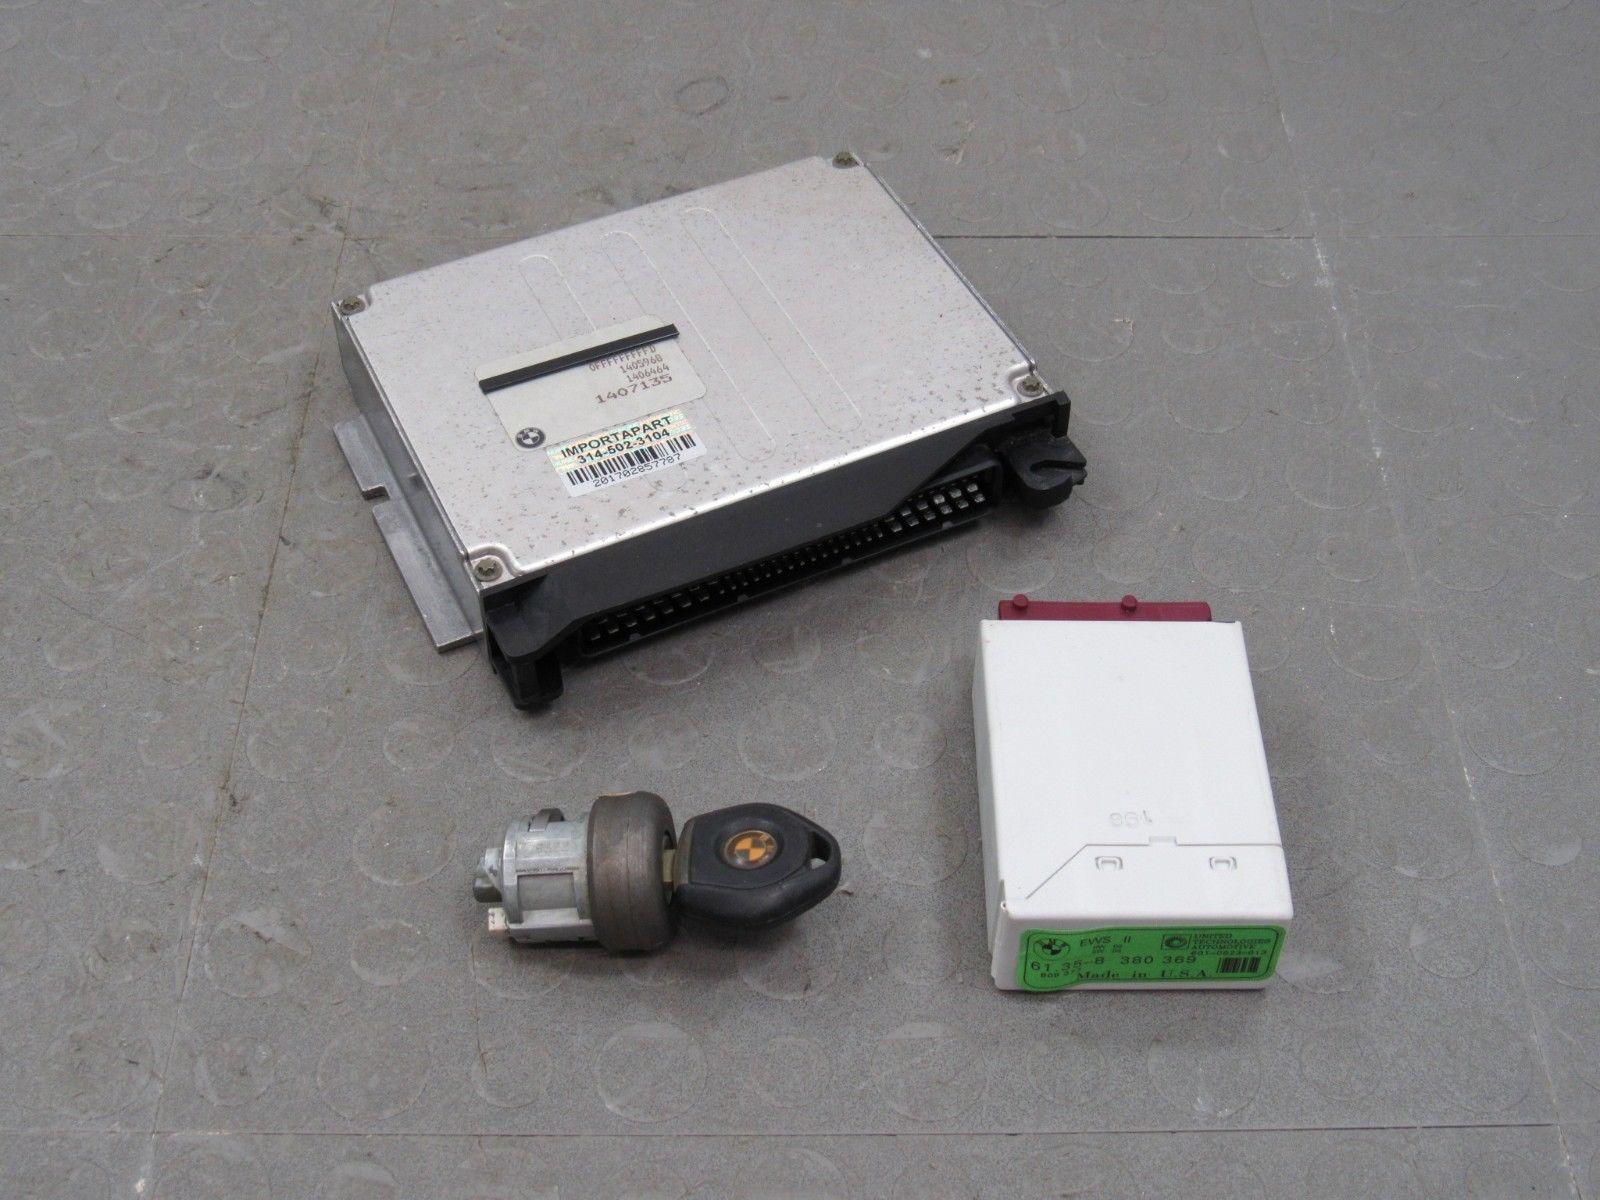 98 99 Bmw M3 S52b32 At E36 Dme Ews Ecu Ecm Pcm Engine Computer Key